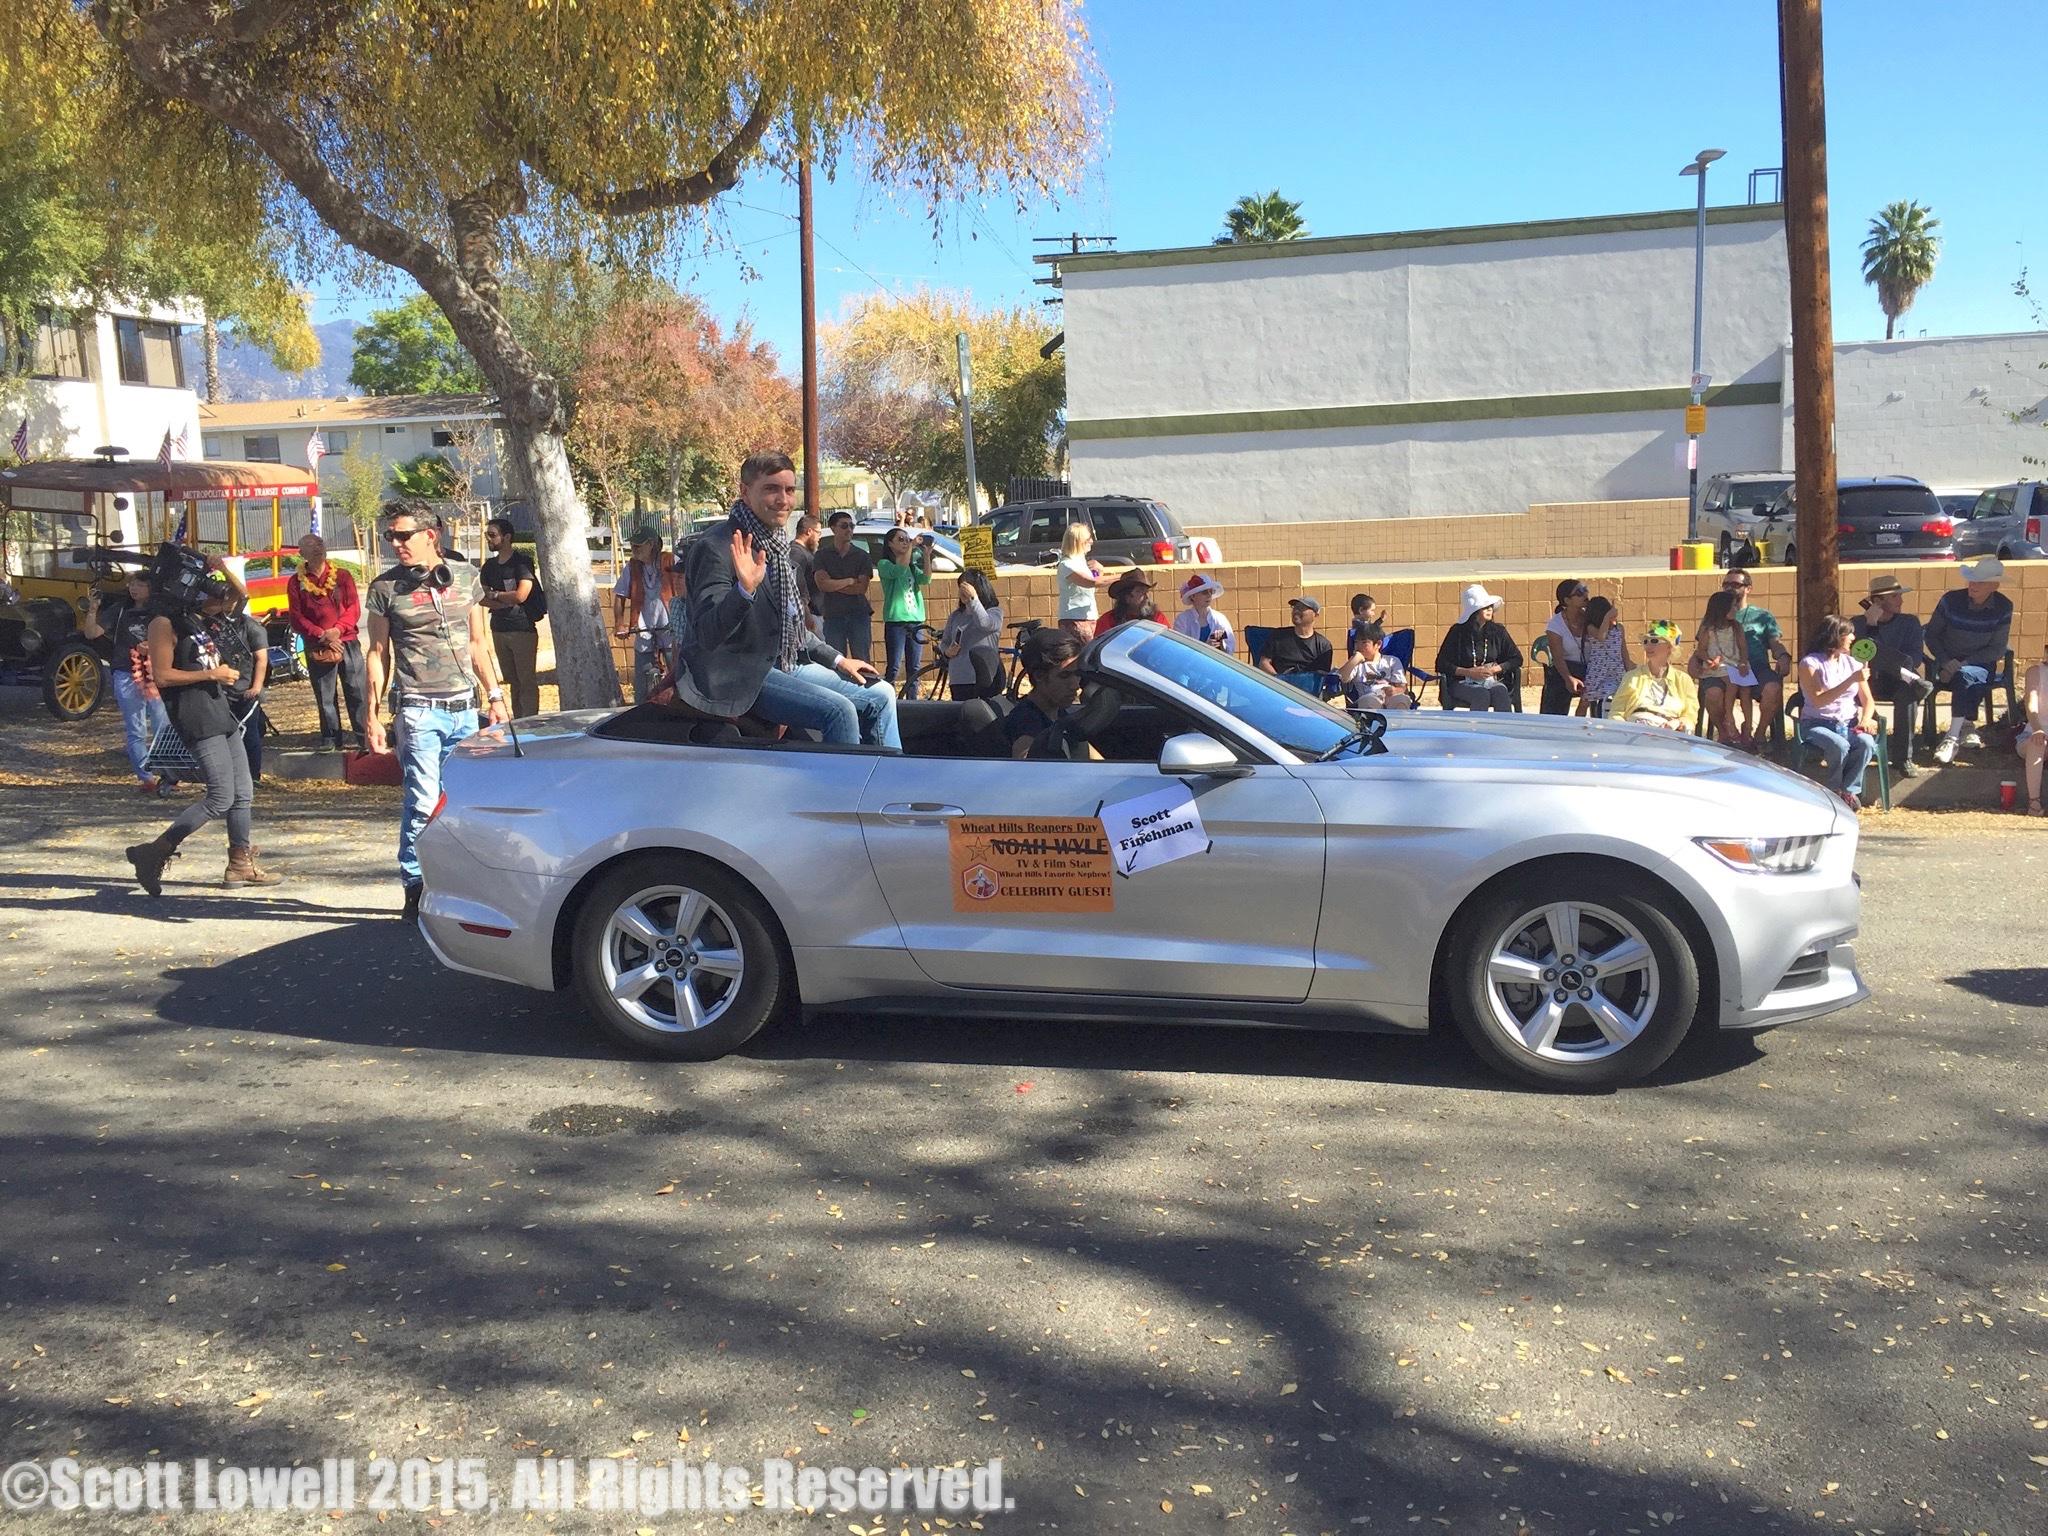 11/22/15 Parade Scene. L to R: Shirley Petchprapa (D.P.), Monty Miranda (Dir.), Scott Lowell